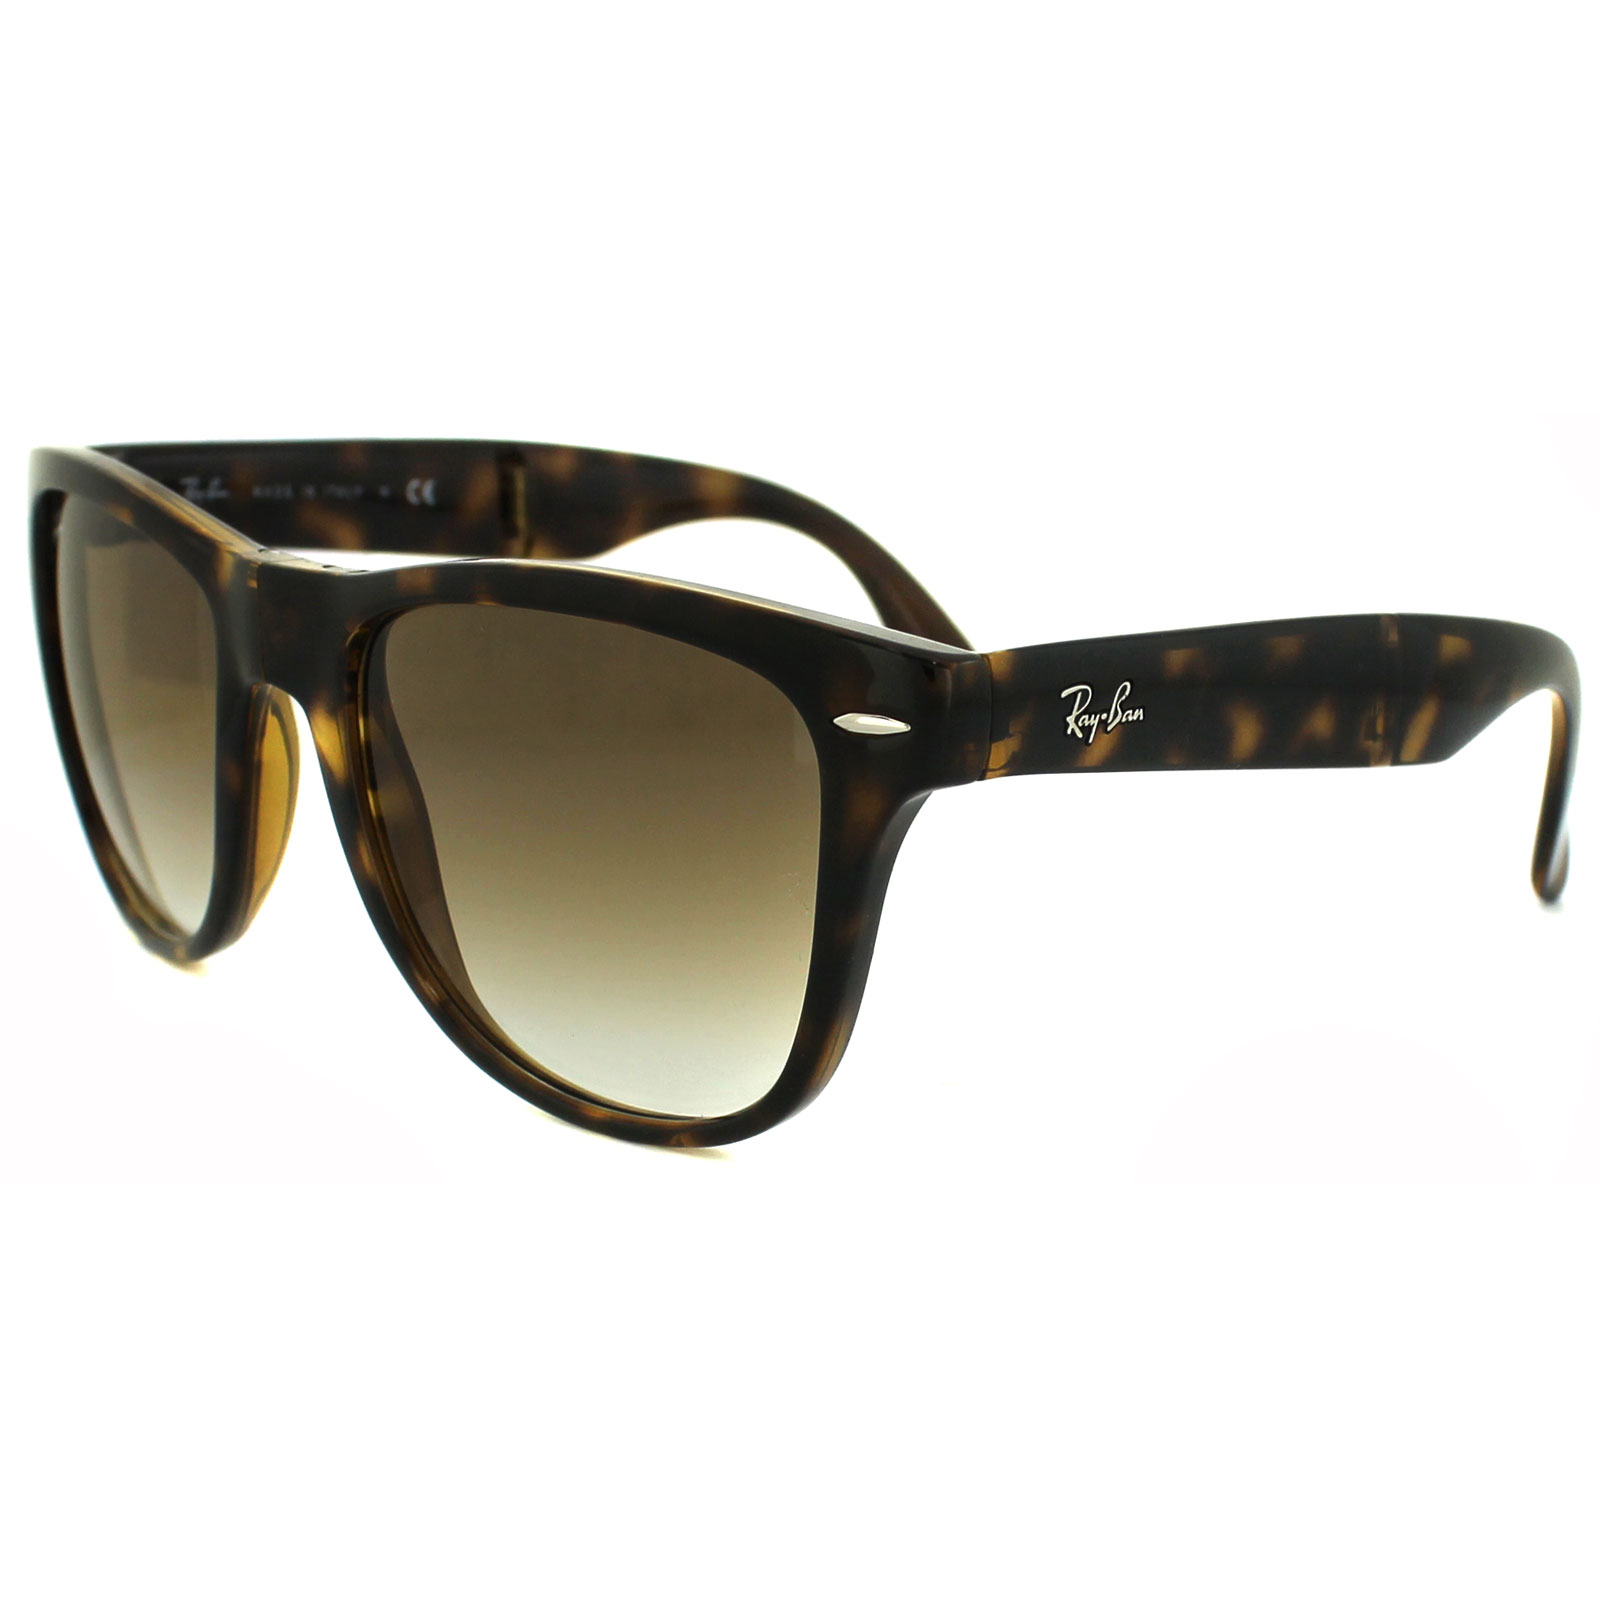 closeout sentinel ray ban sunglasses folding wayfarer 4105 light havana  brown gradient 710 51 l a0ab2 6158b559c151